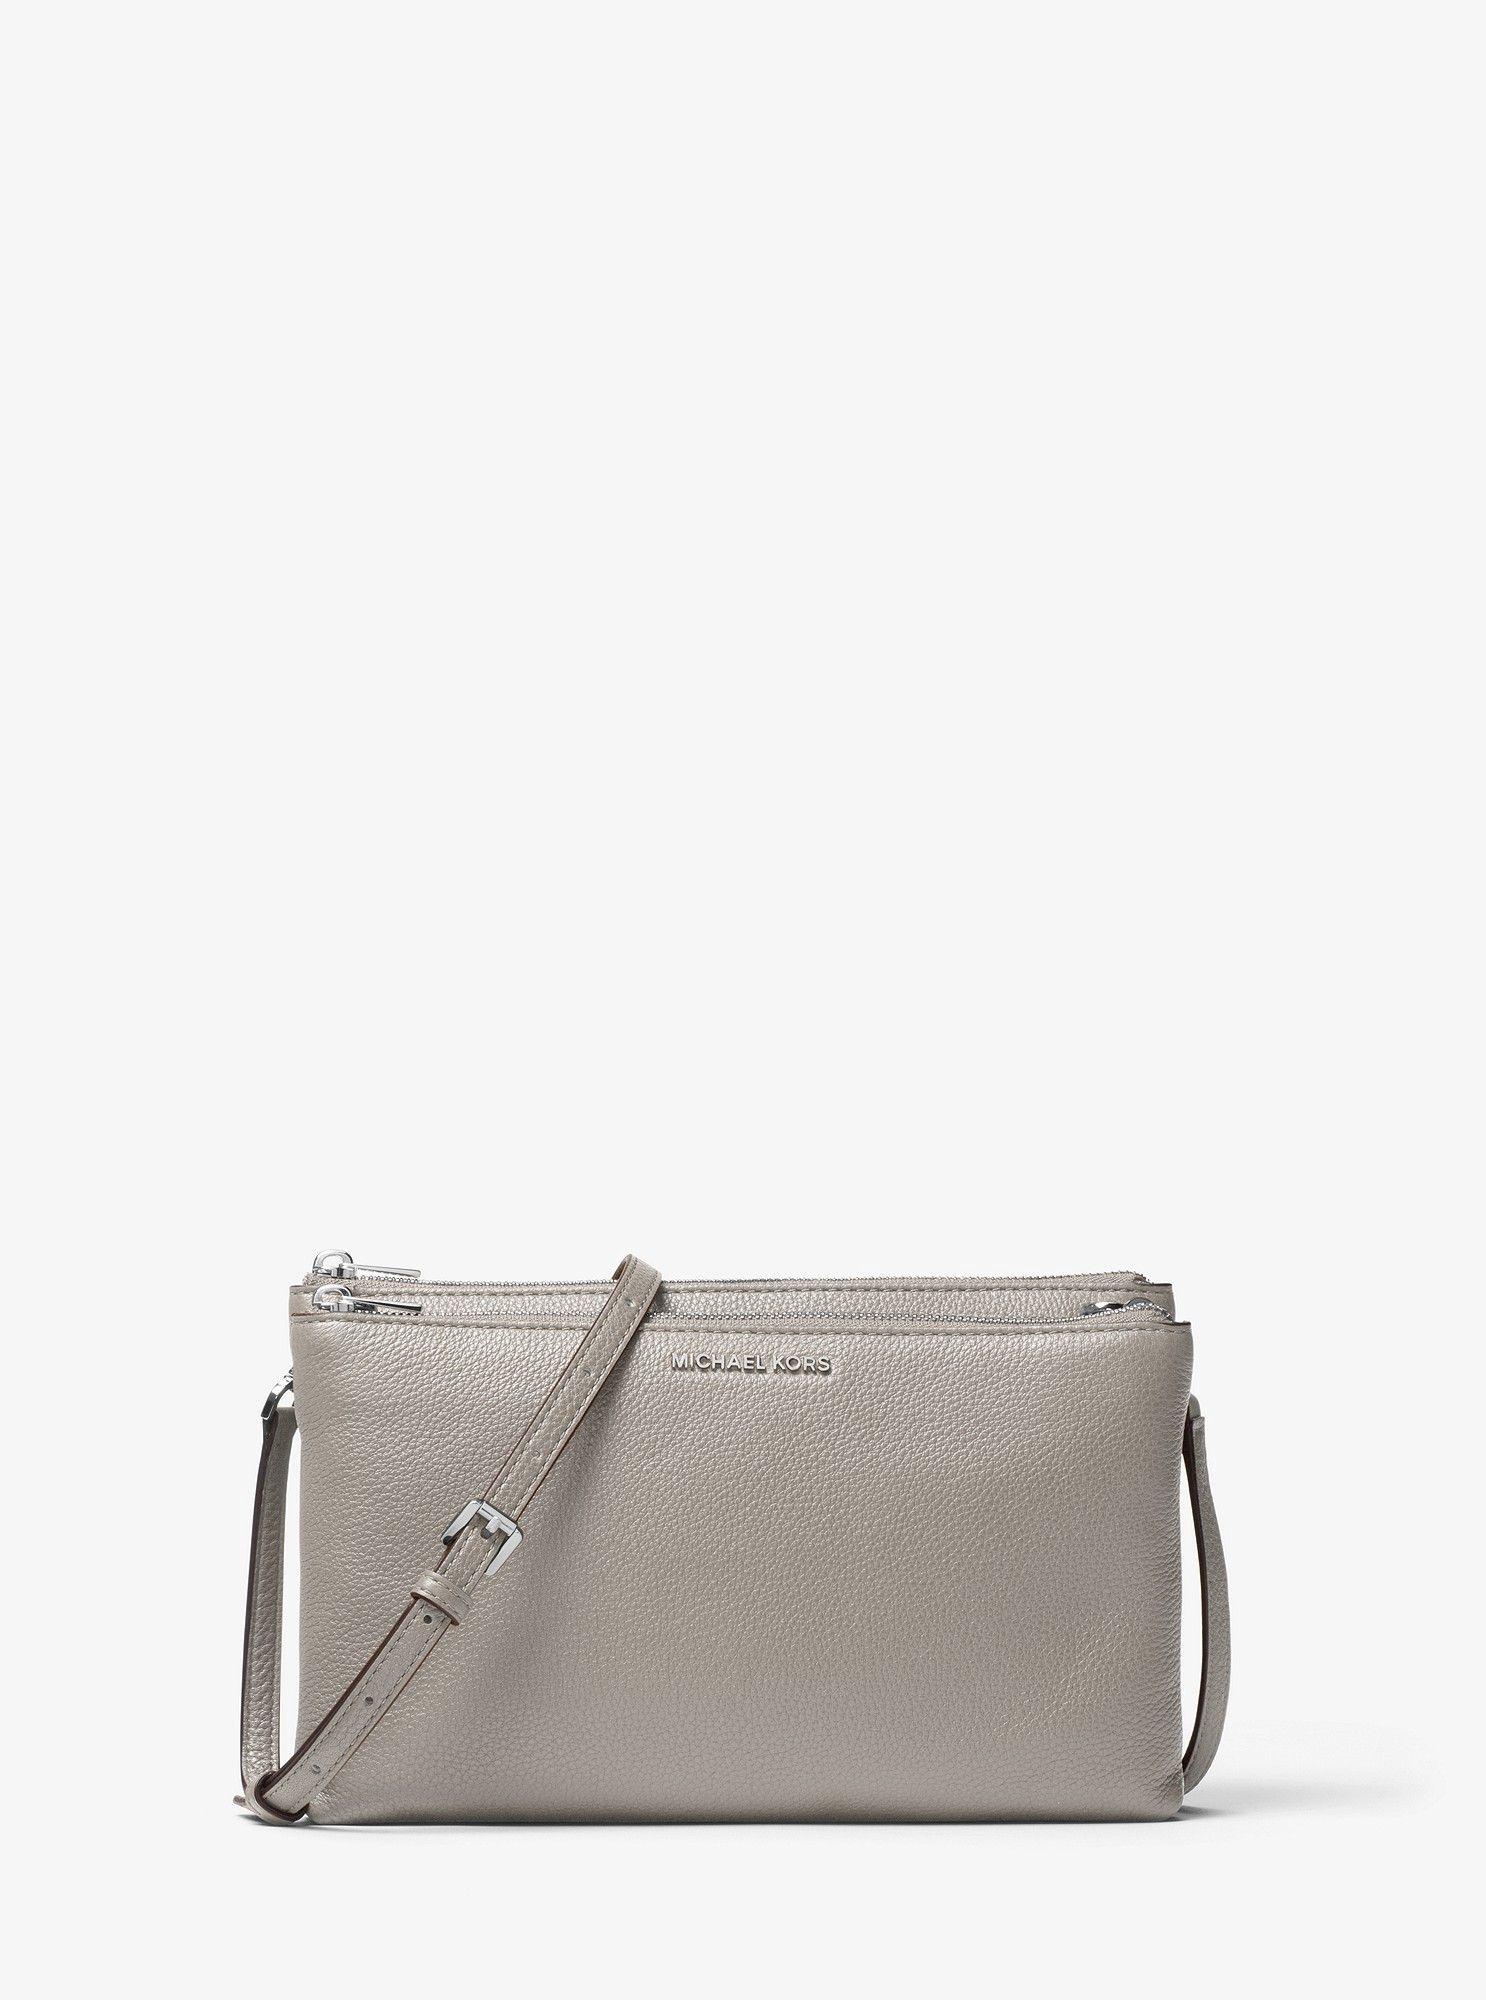 2f1f84bc9bb8 Michael Kors Adele Leather Crossbody - Pearl Grey